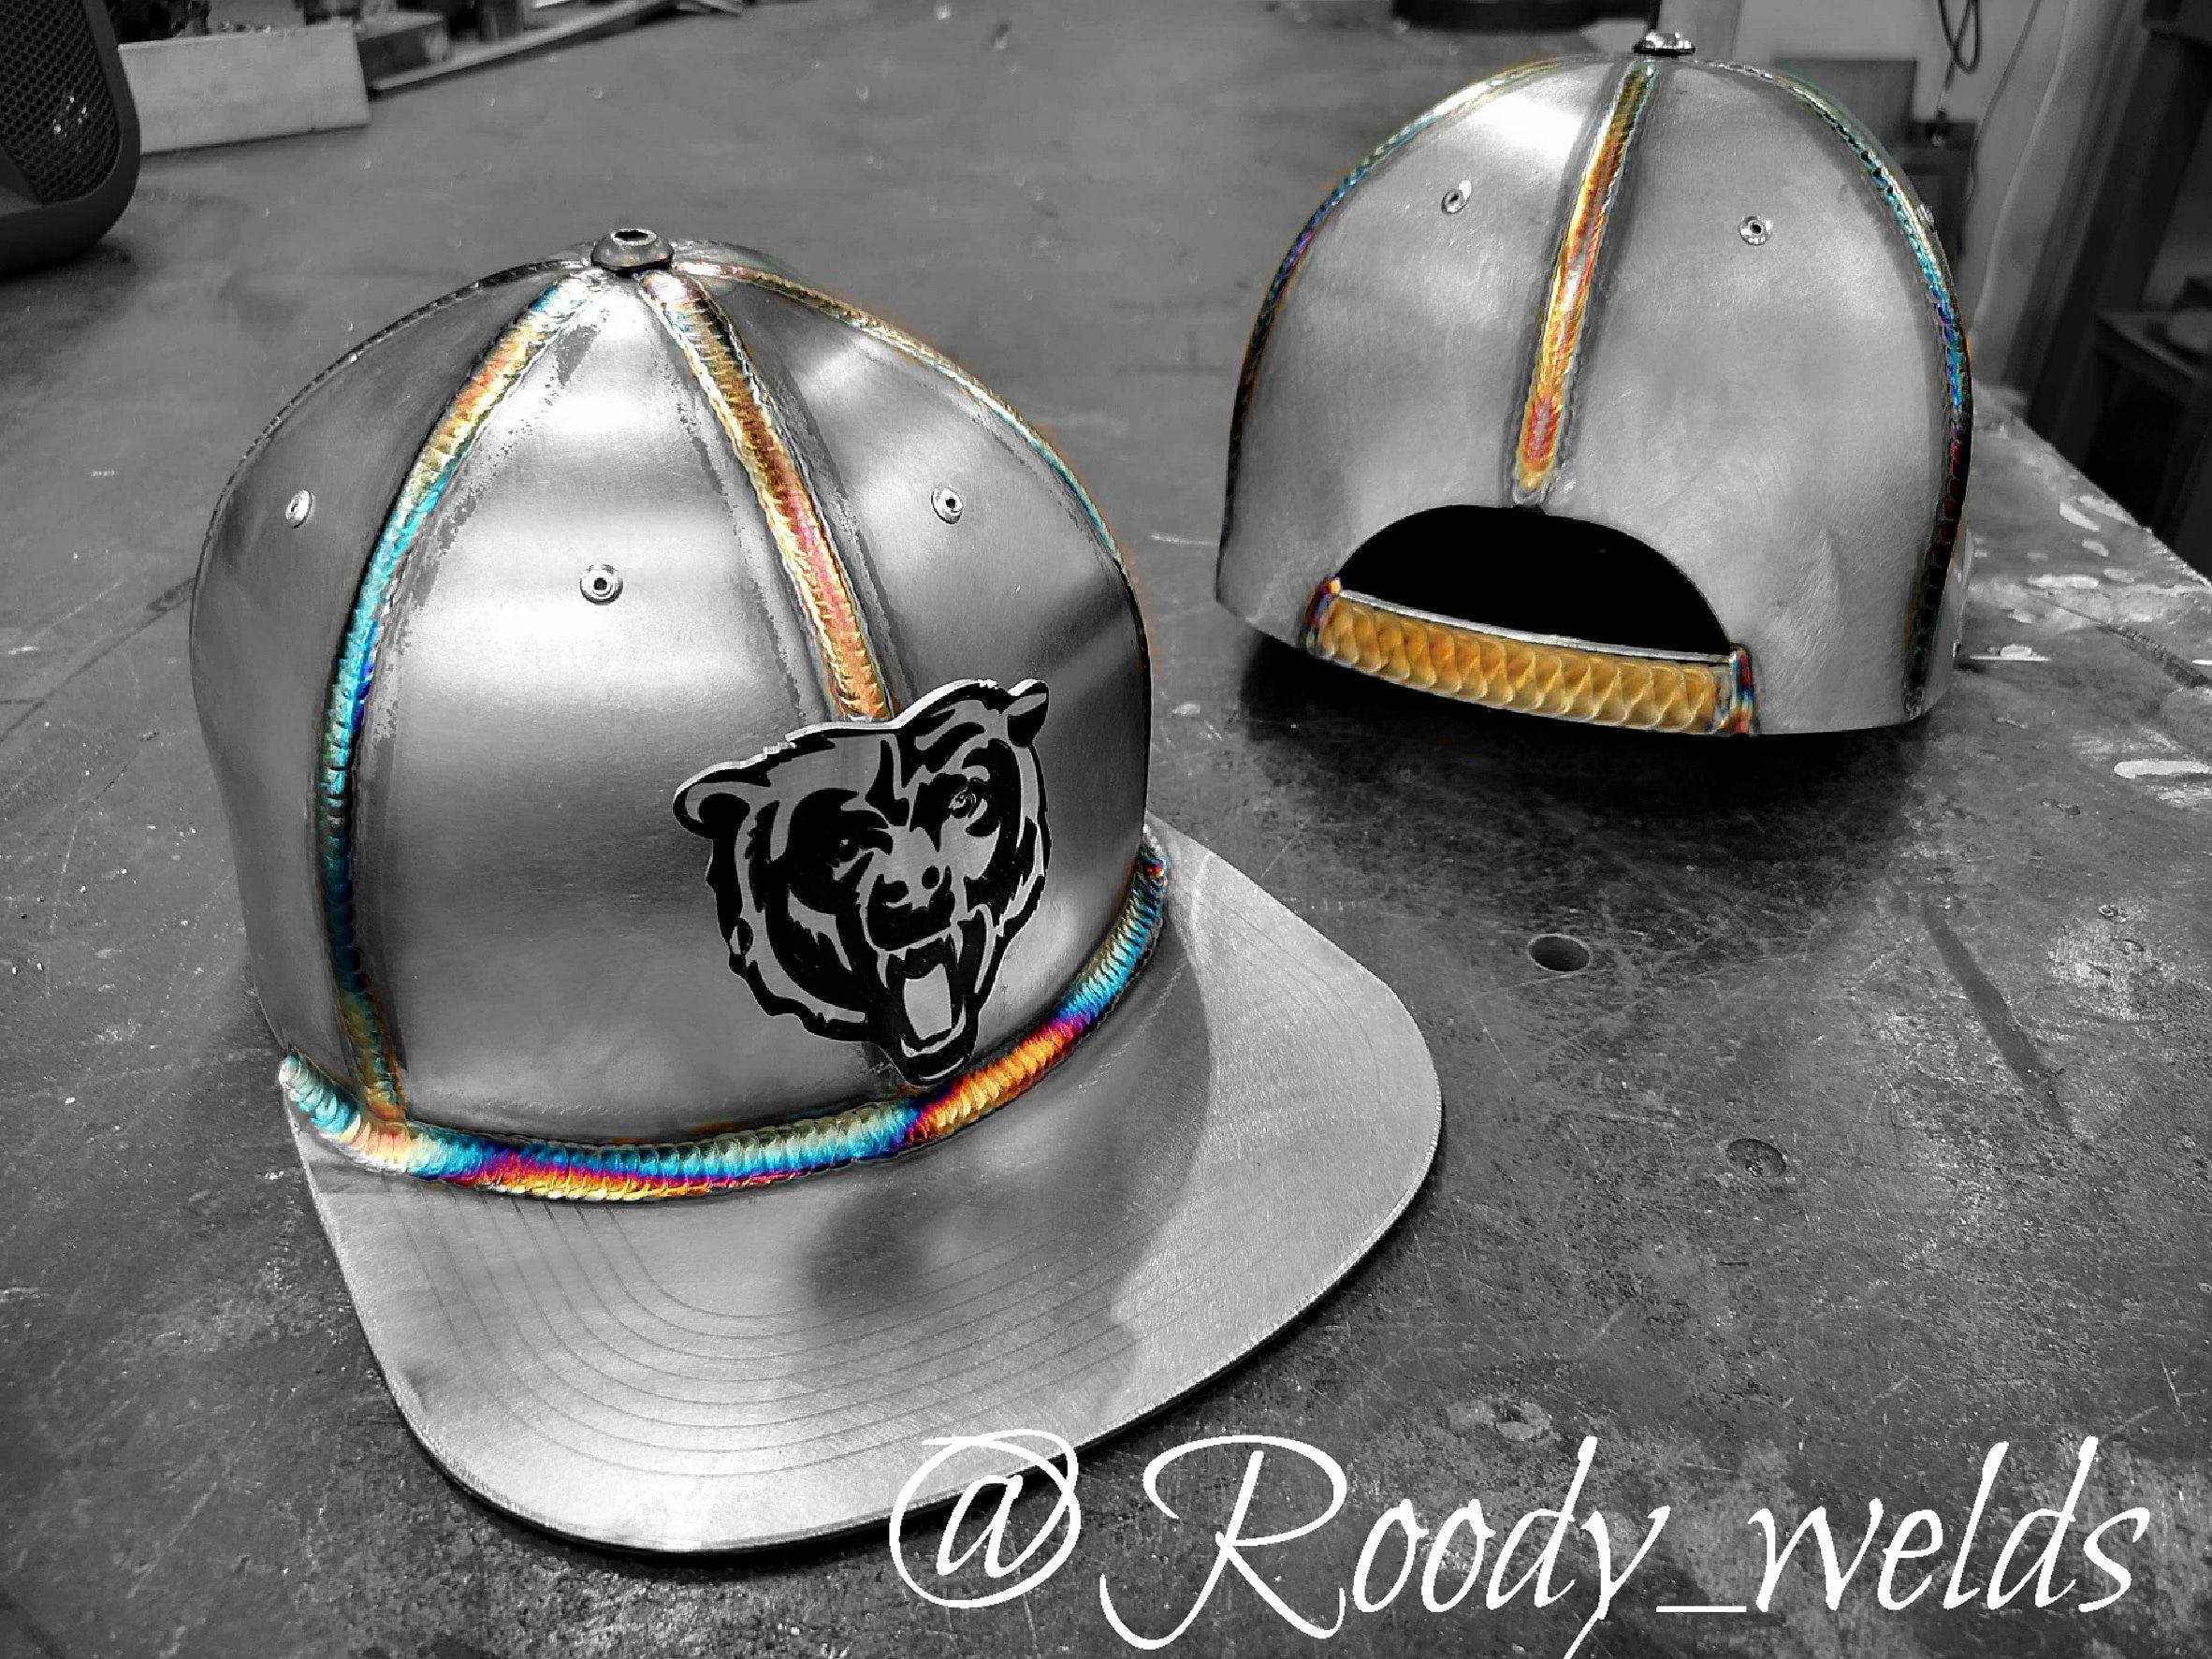 My Money On The Bears Nfl Welding Art Projects Welding Art Metal Art Projects